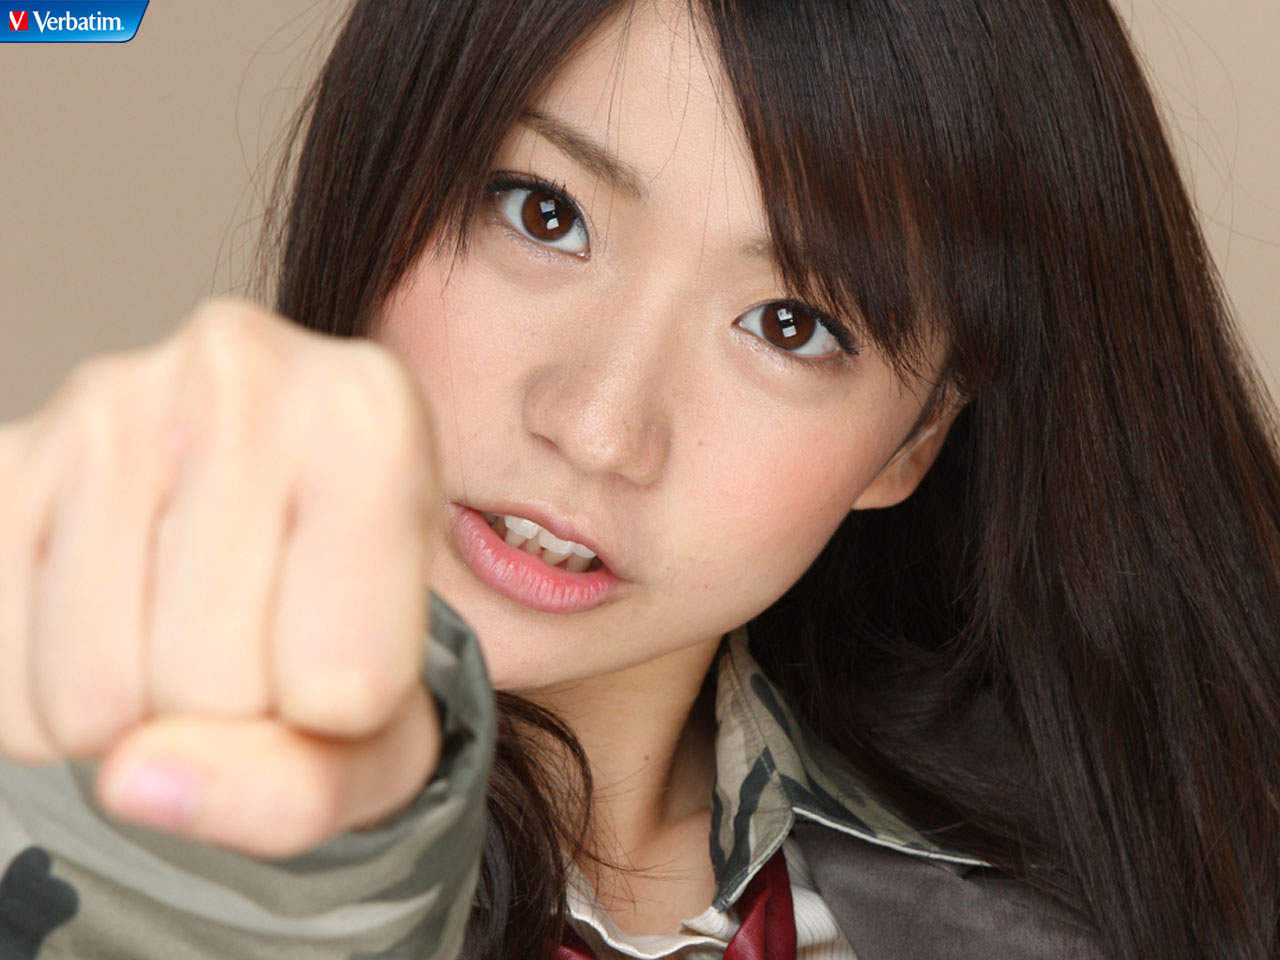 AKB48 Oshima Yuko Wallpaper